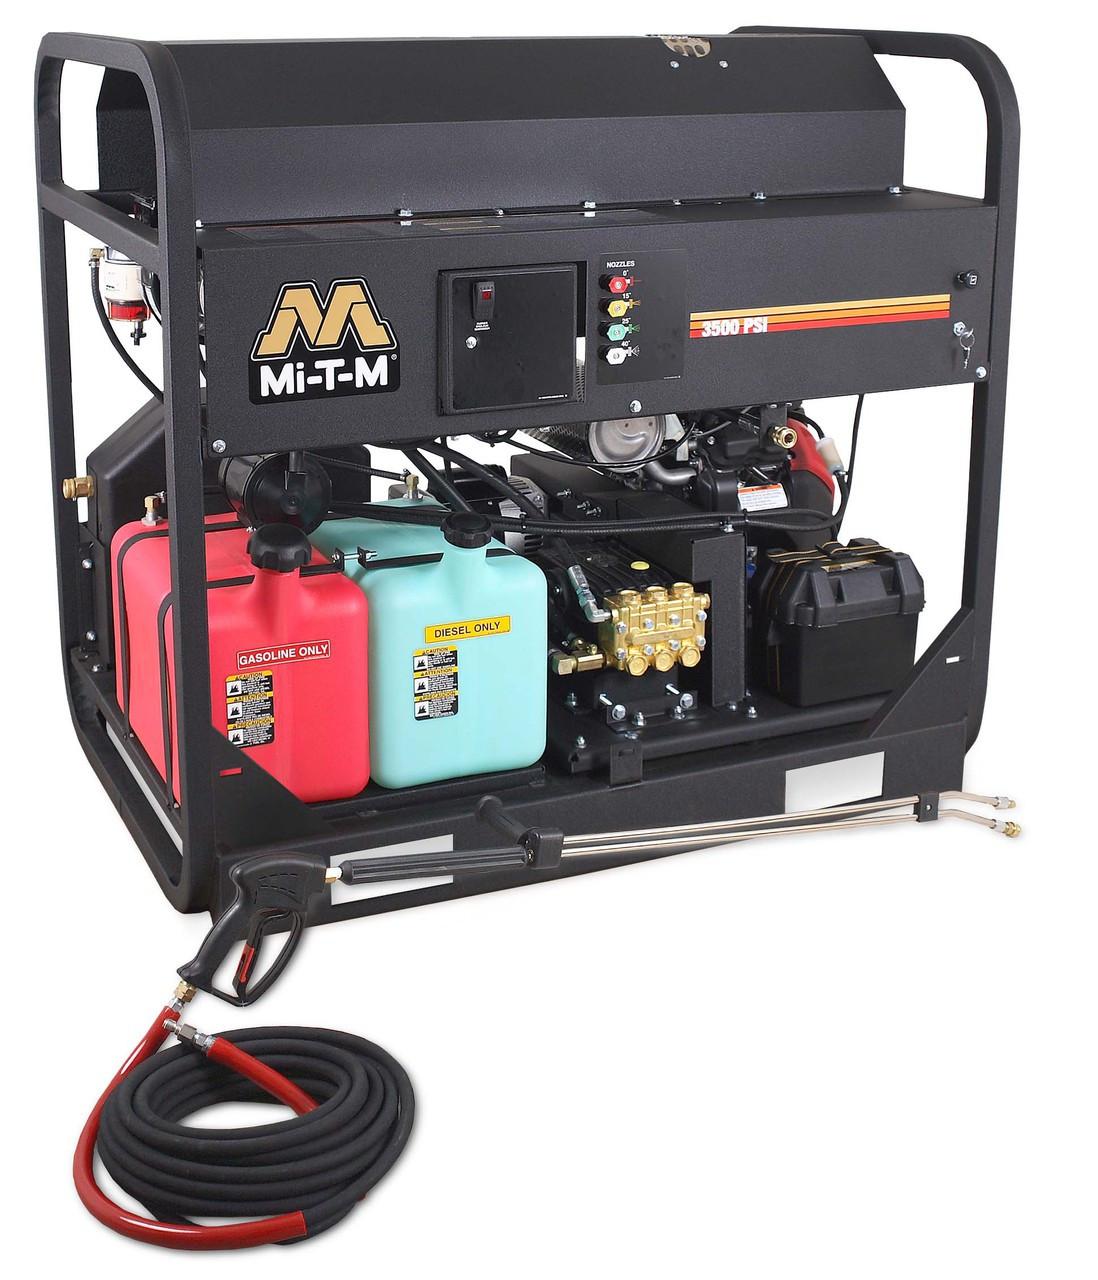 mi t m wiring diagram circuit connection diagram u2022 rh wiringdiagraminc today Mi-T-M Compressor Mi-T-M 3500 PSI